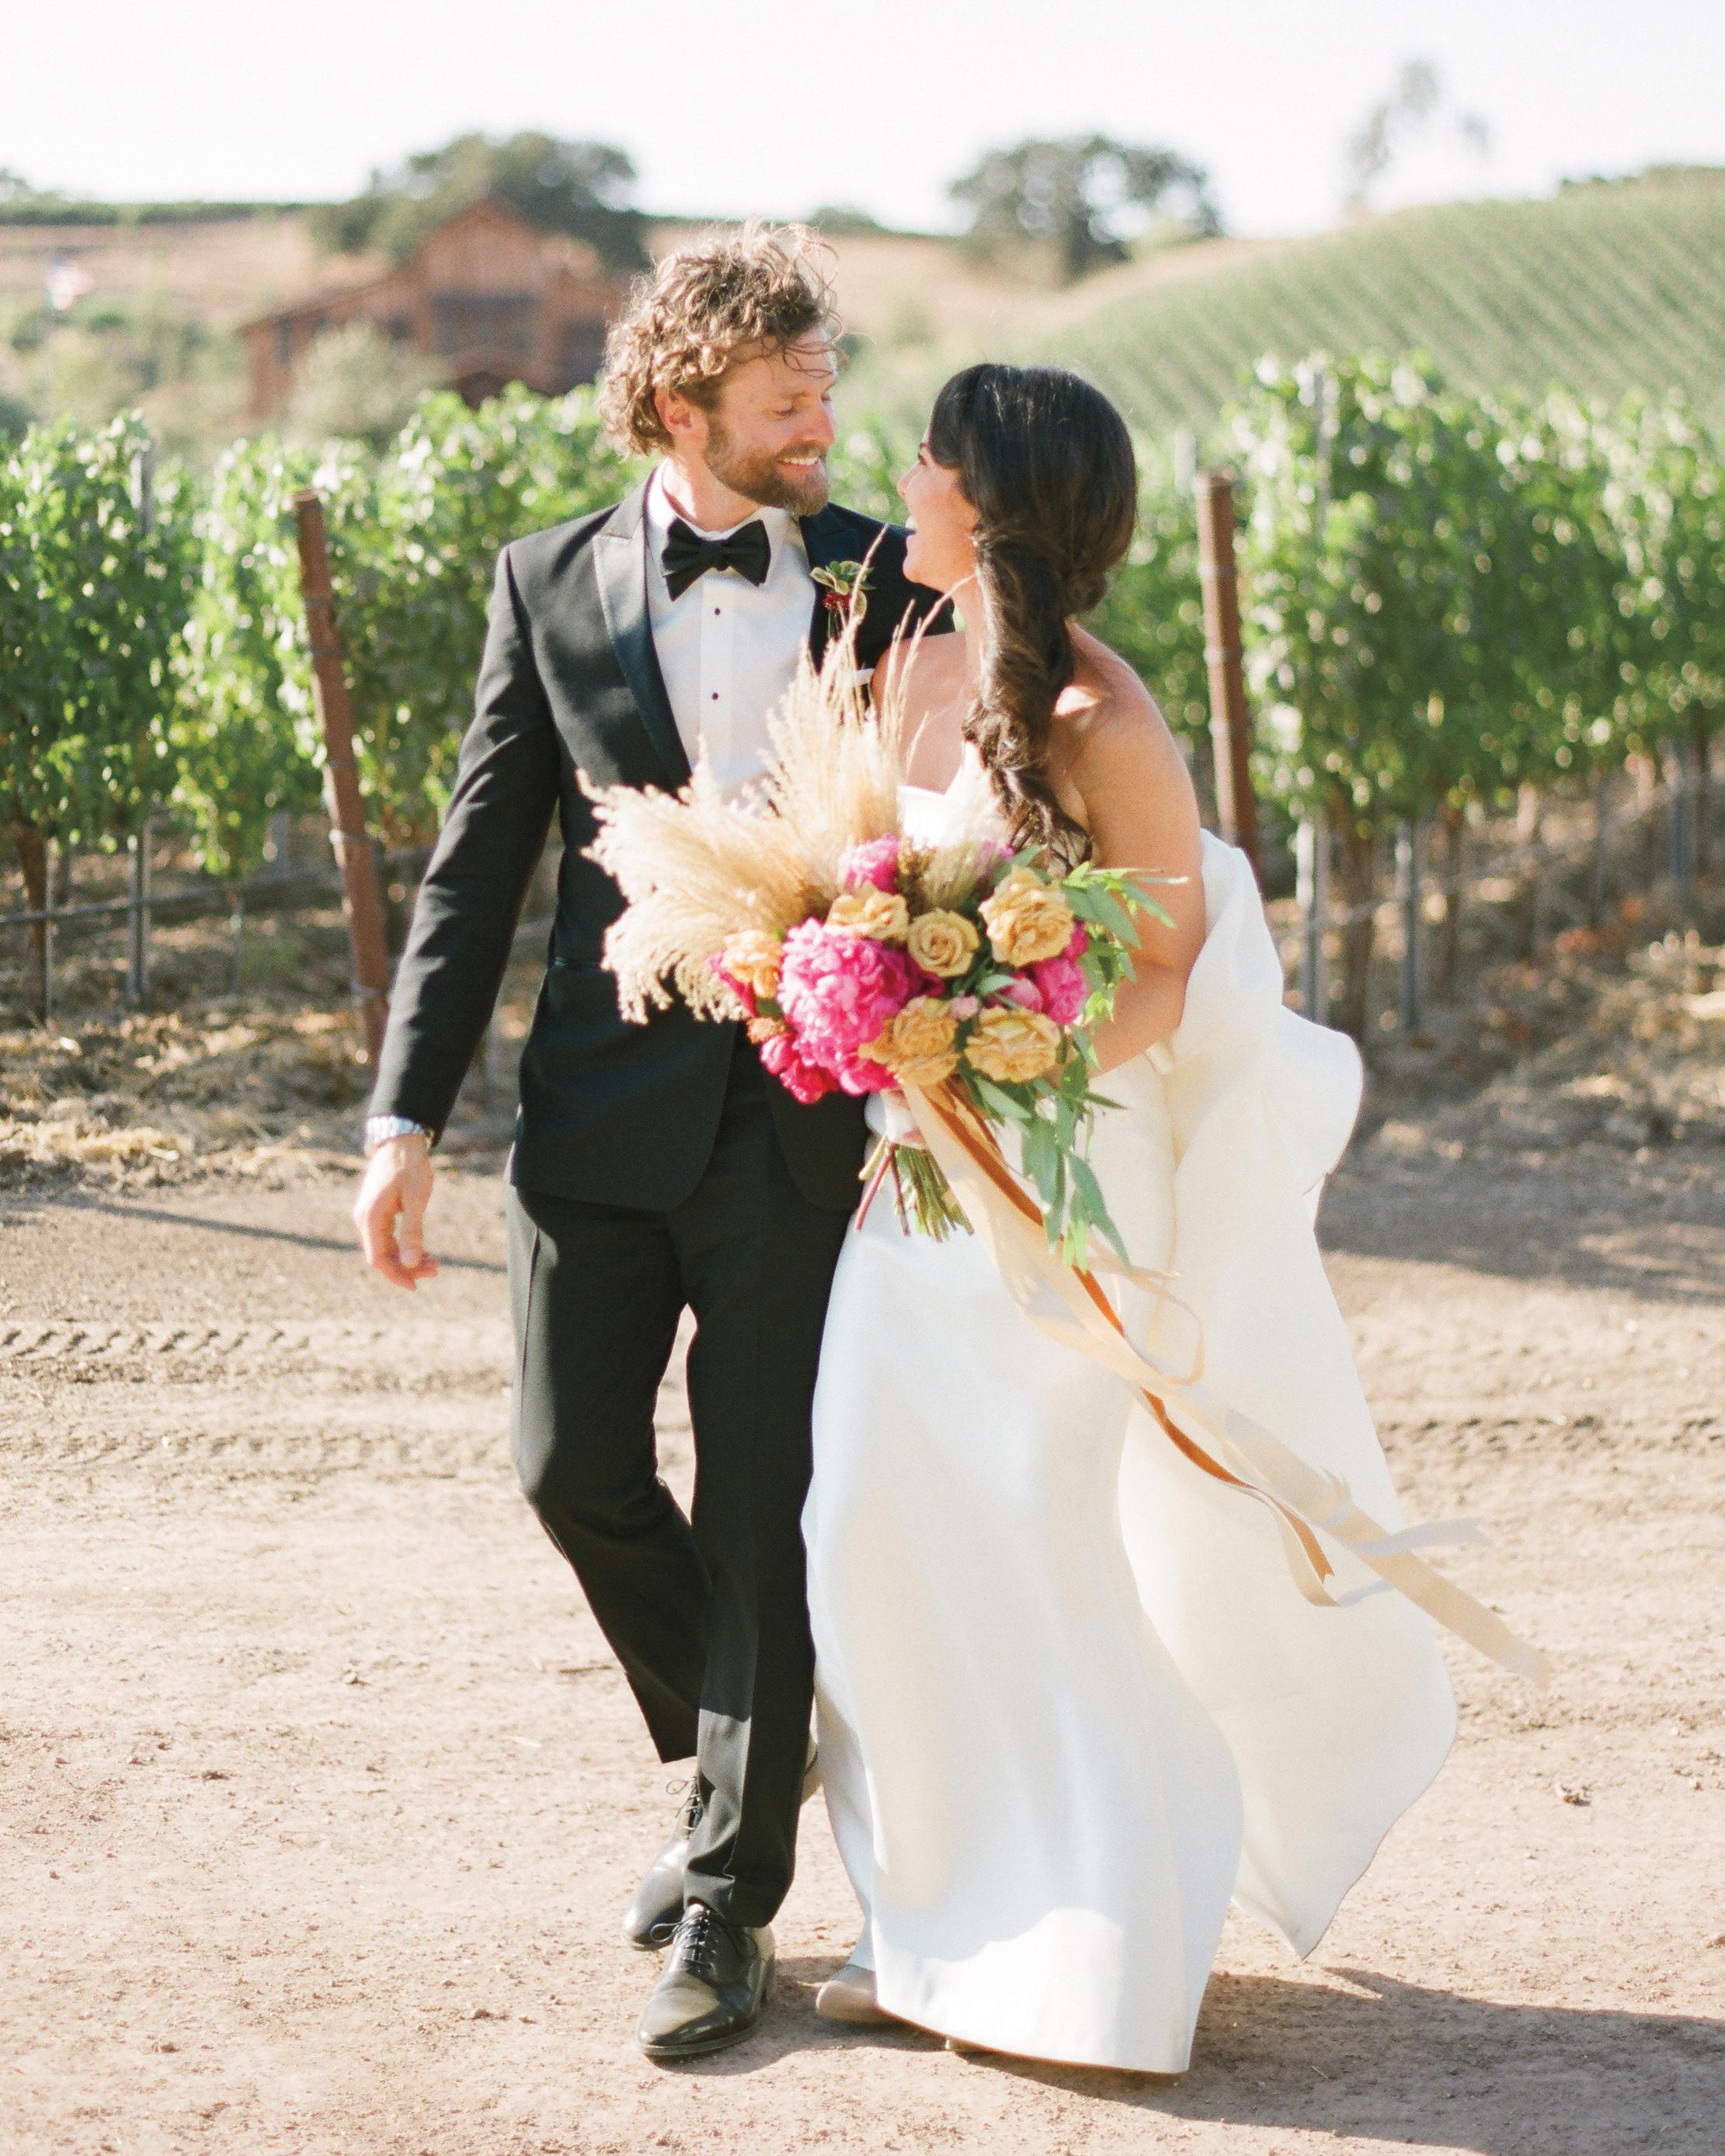 corrine-patrick-wedding-santa-ynez-44420001-s110842.jpg